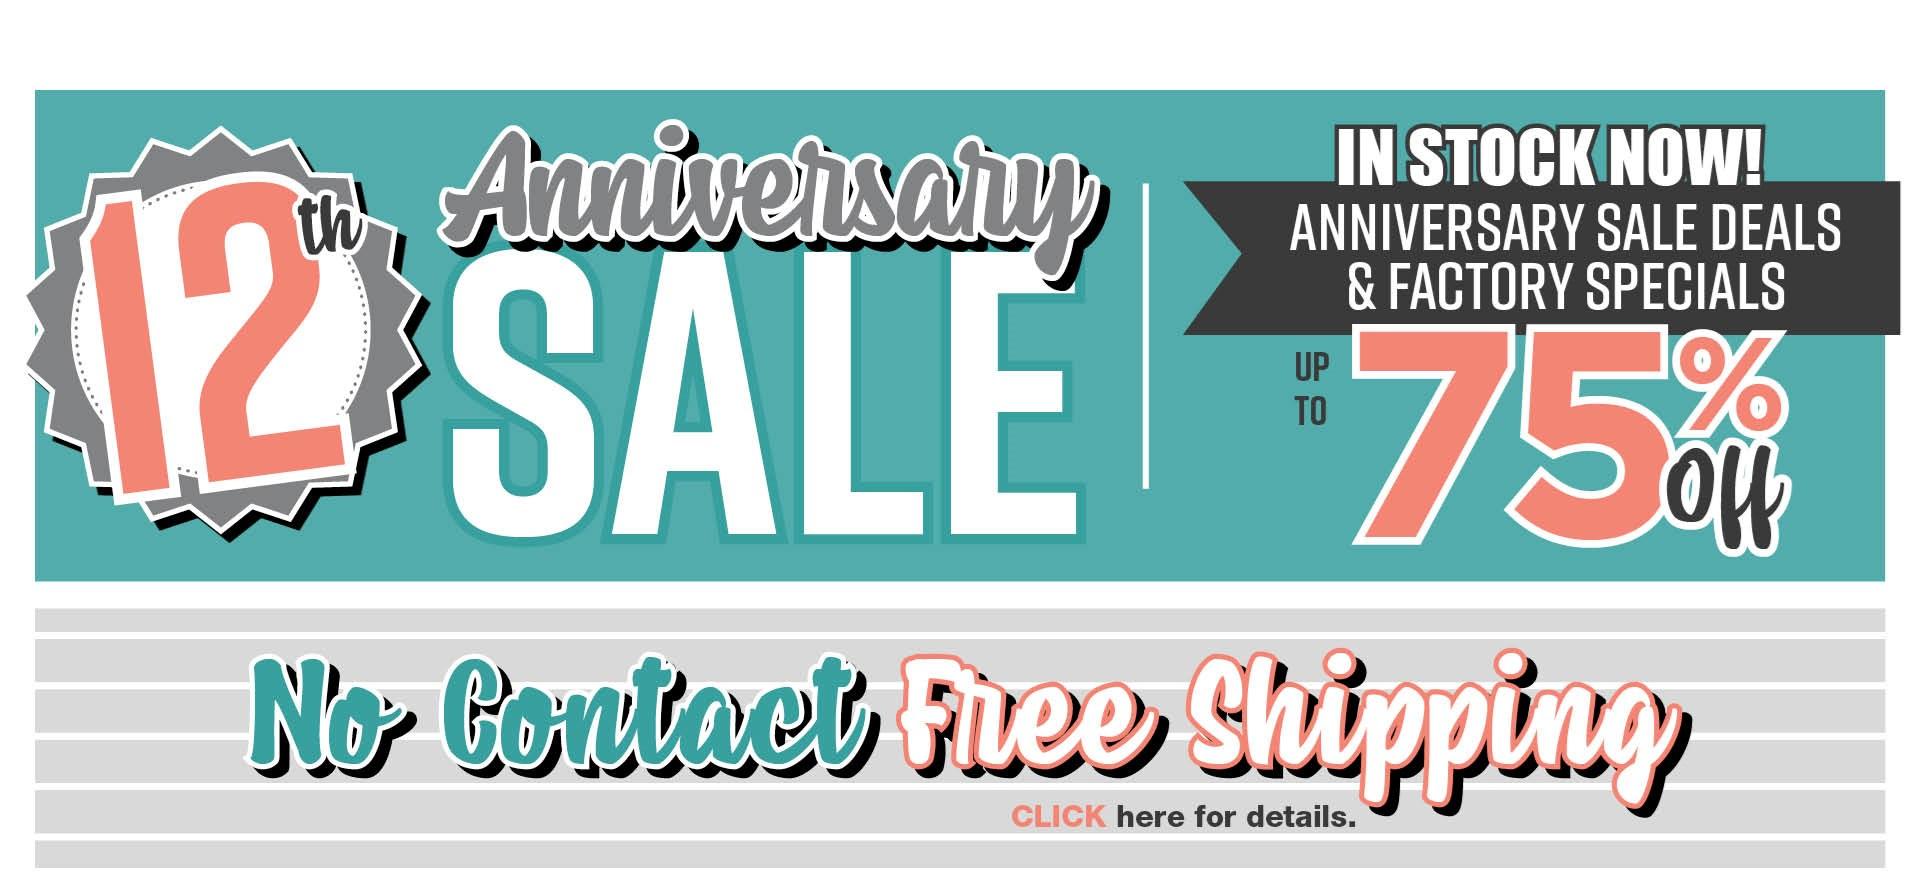 anniversary-sale-2021